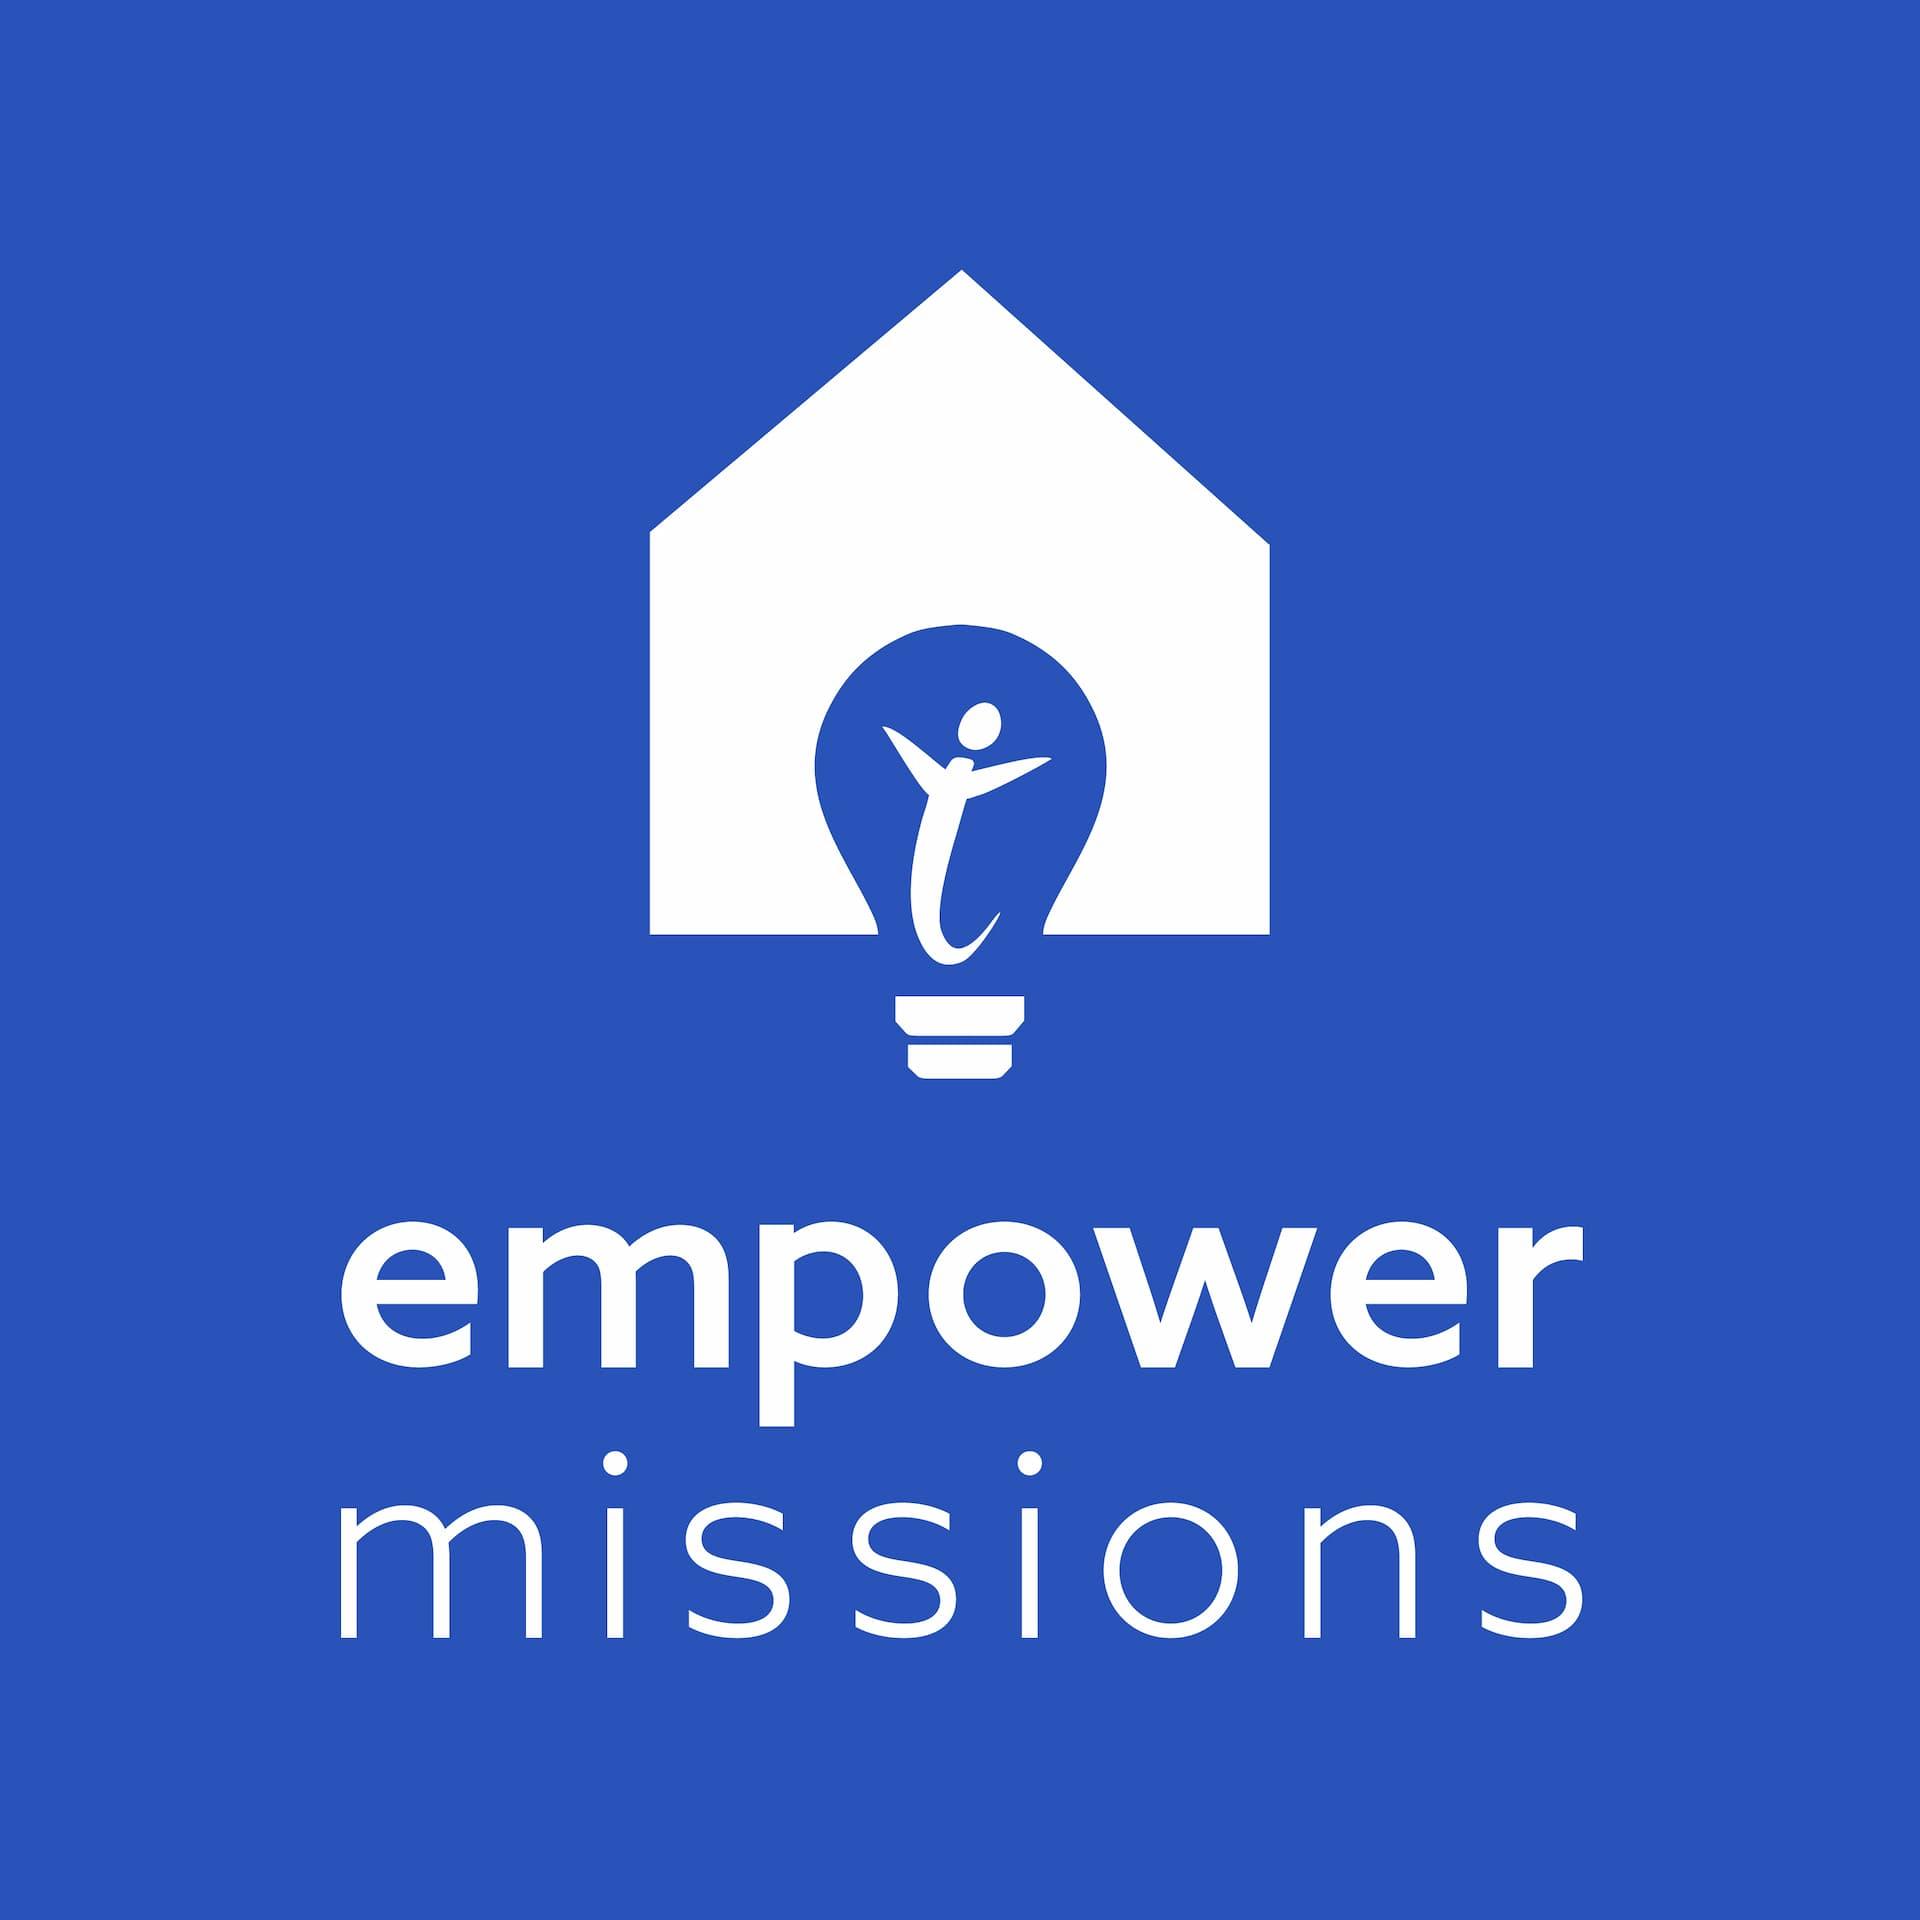 logodesign, empower